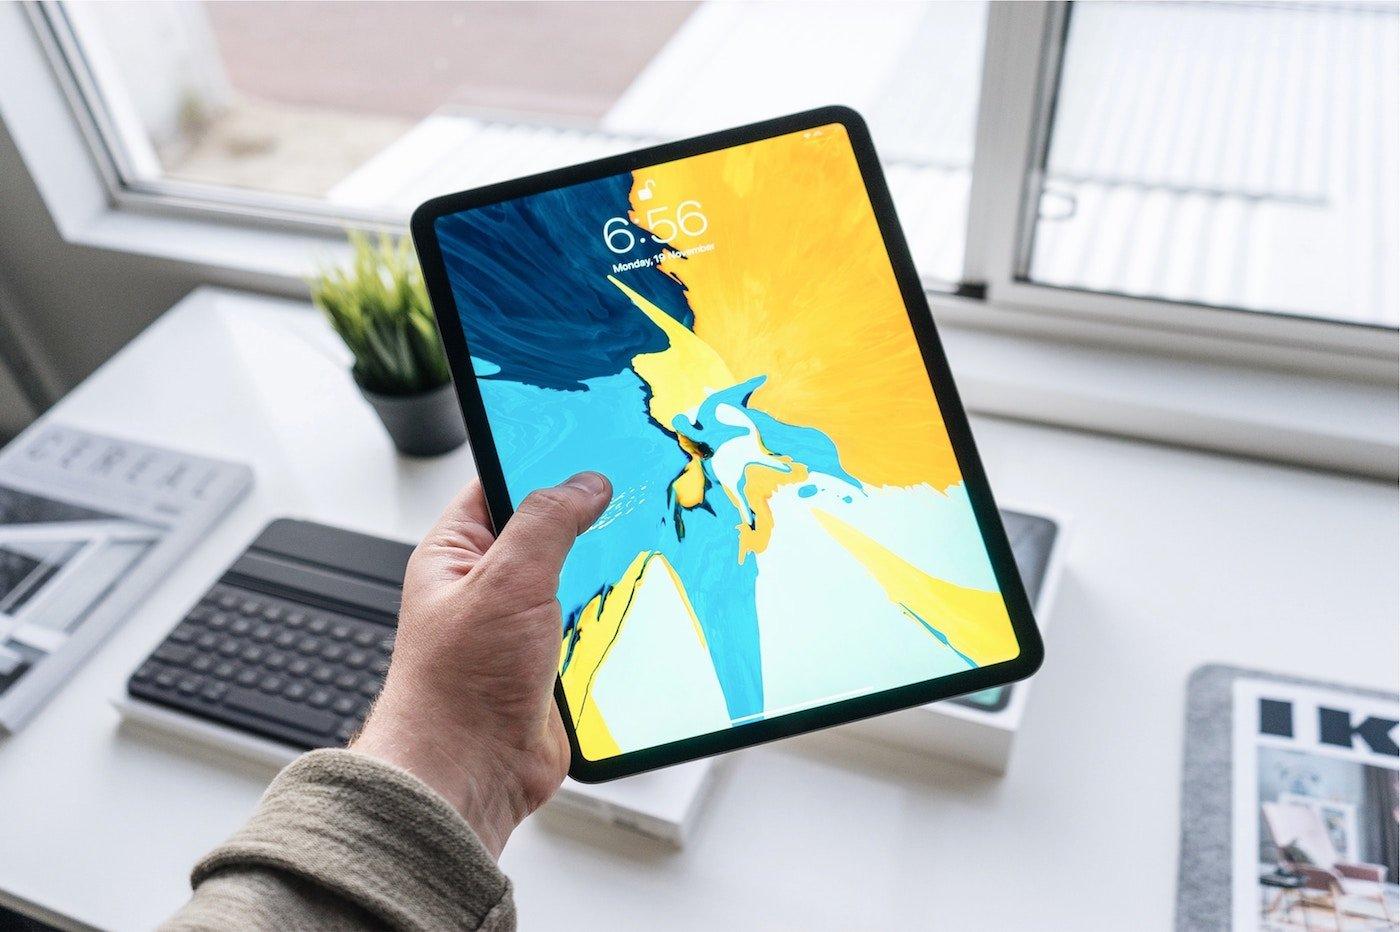 IPad 2019 Apple